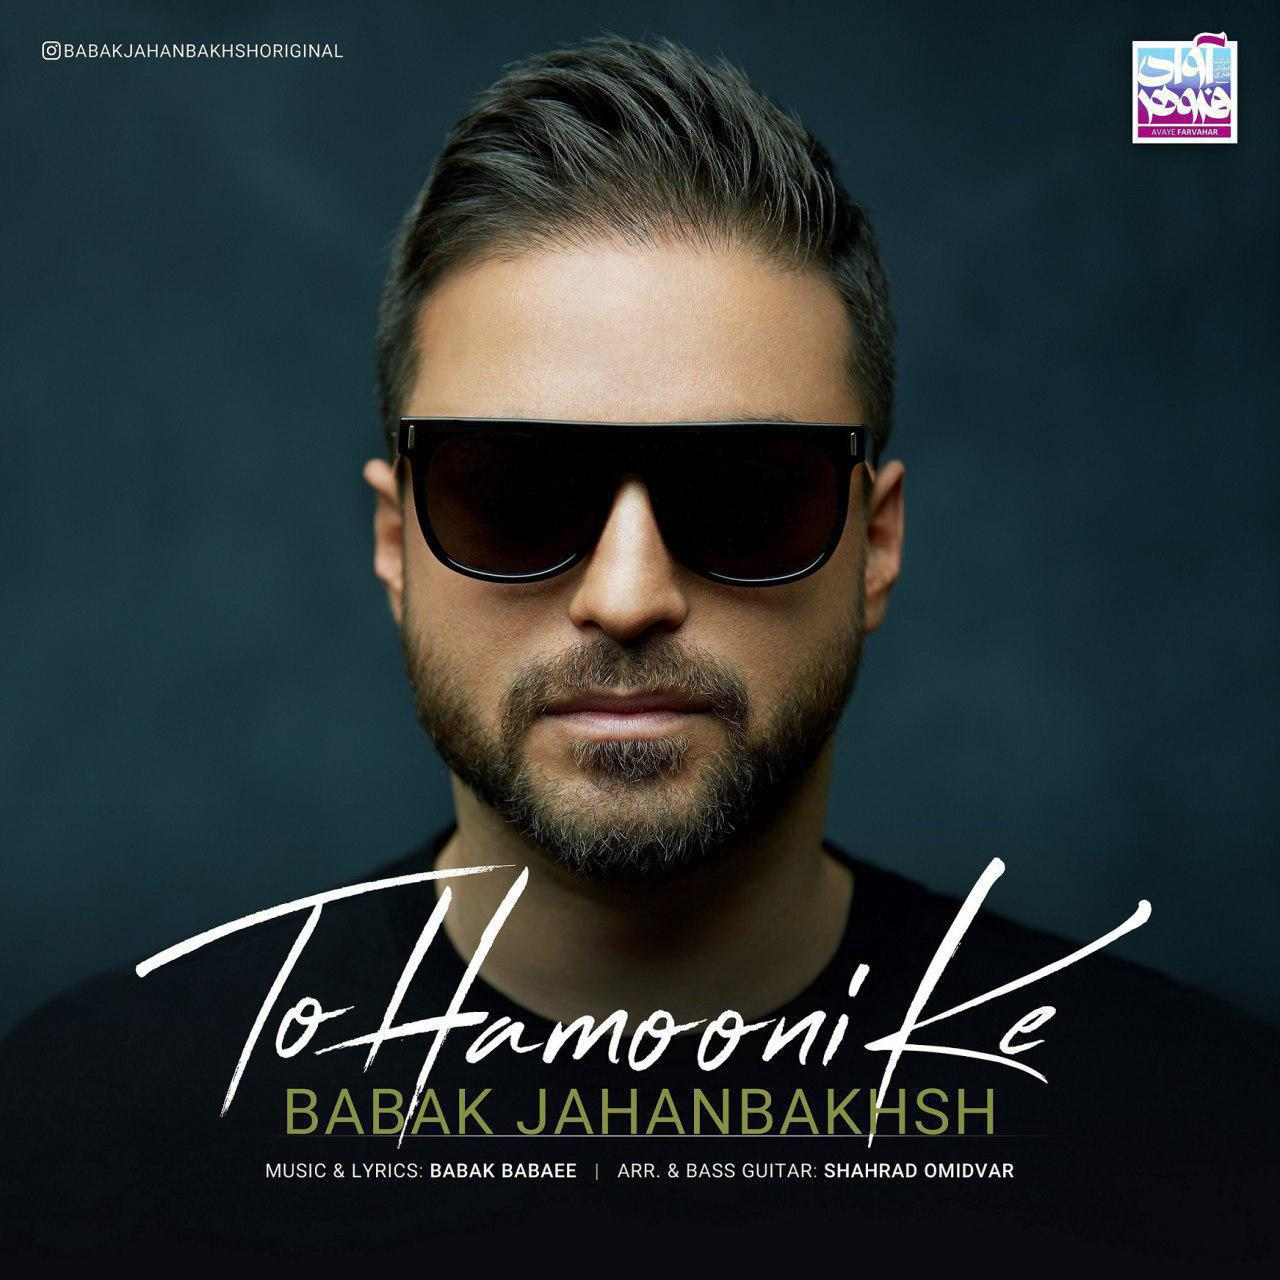 Babak Jahanbakhsh – To Hamooni Ke